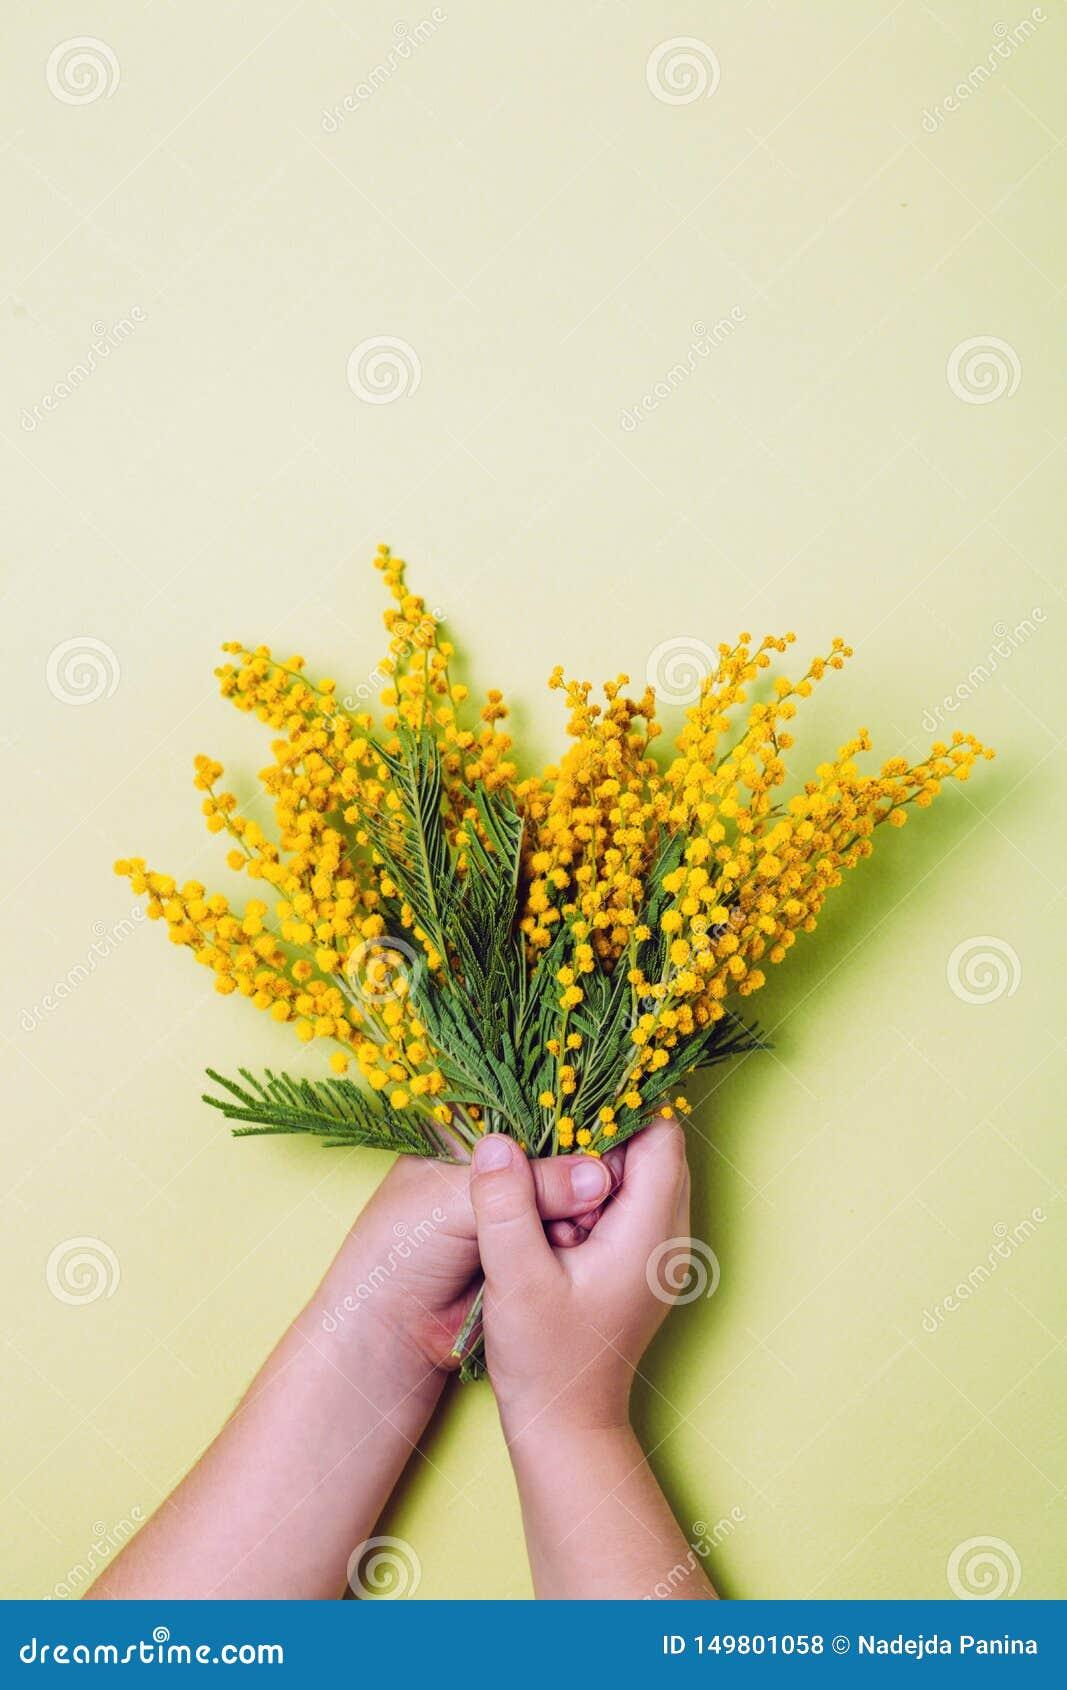 Kindhand die gele mimosabloemen op gele achtergrond houden